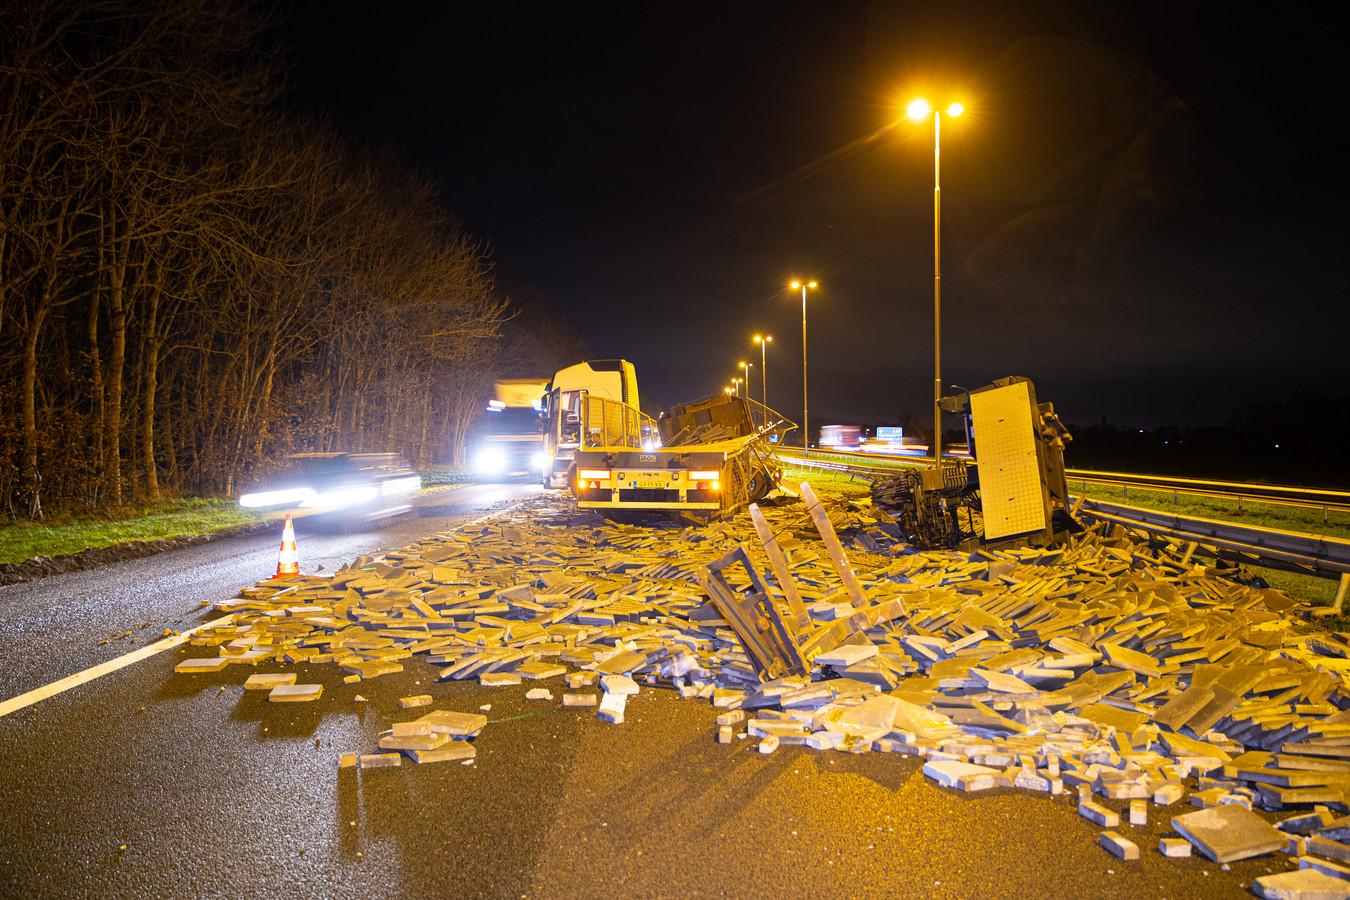 Stoeptegels op de snelweg: ravage op de A50.